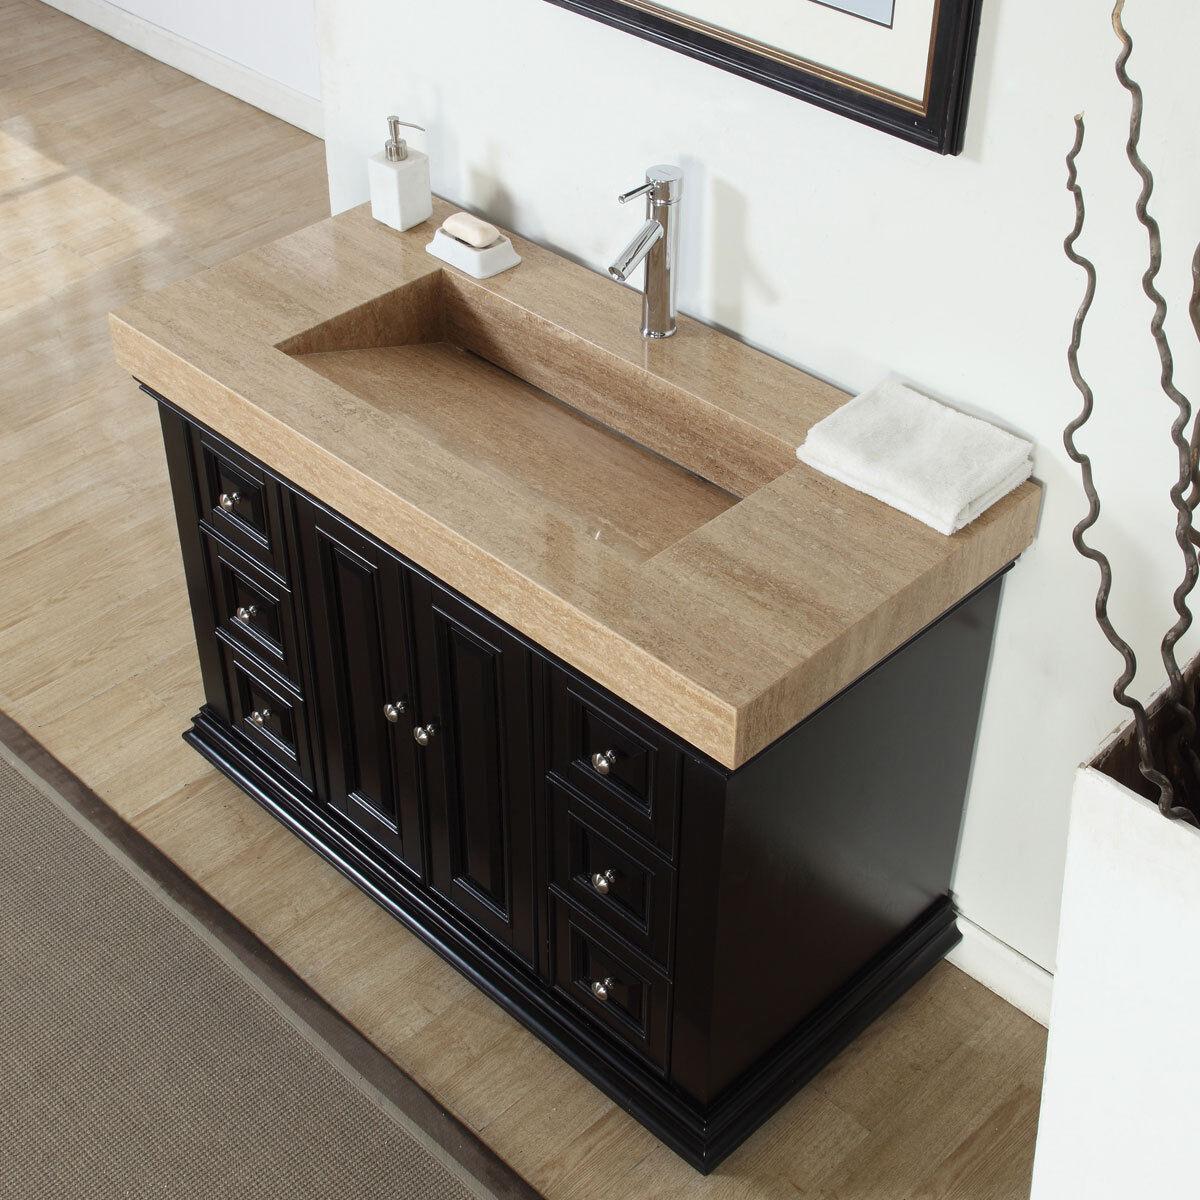 48 Inch Modern Bathroom Single Vanity Cabinet Travertine Top Ramp Sink 0284t 609224901591 Ebay